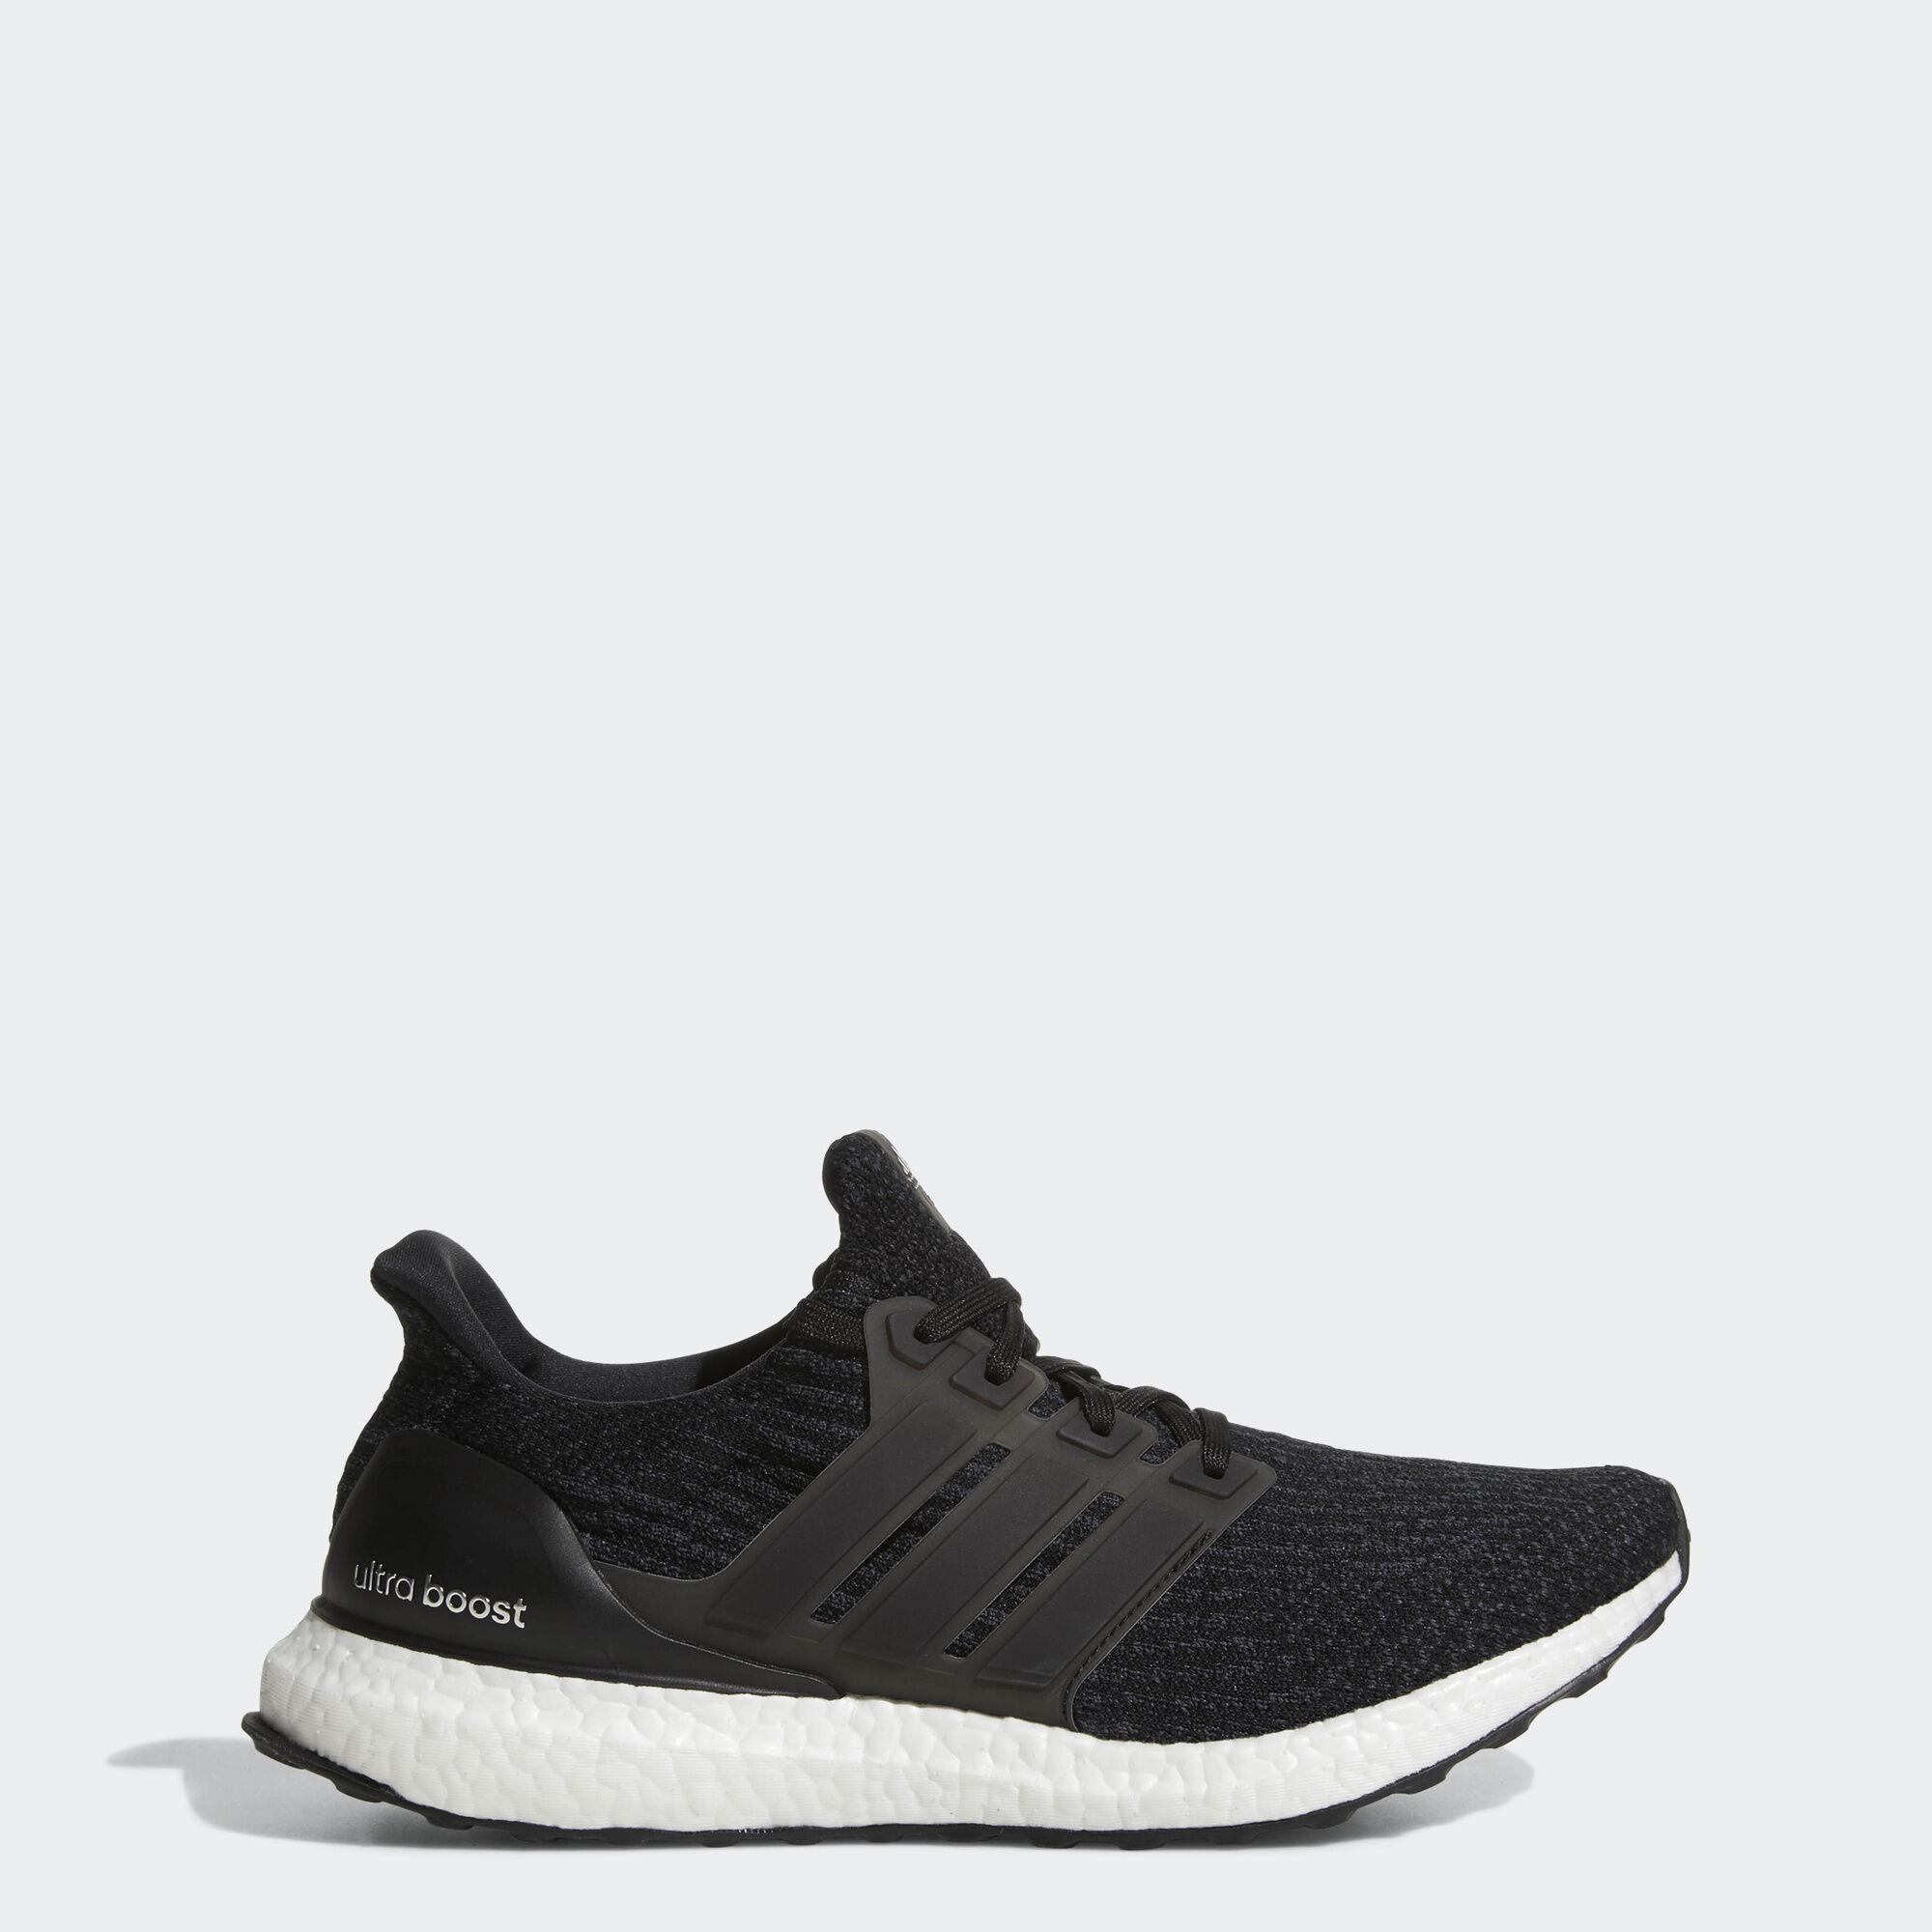 Adidas Ultra Boost Black Caged